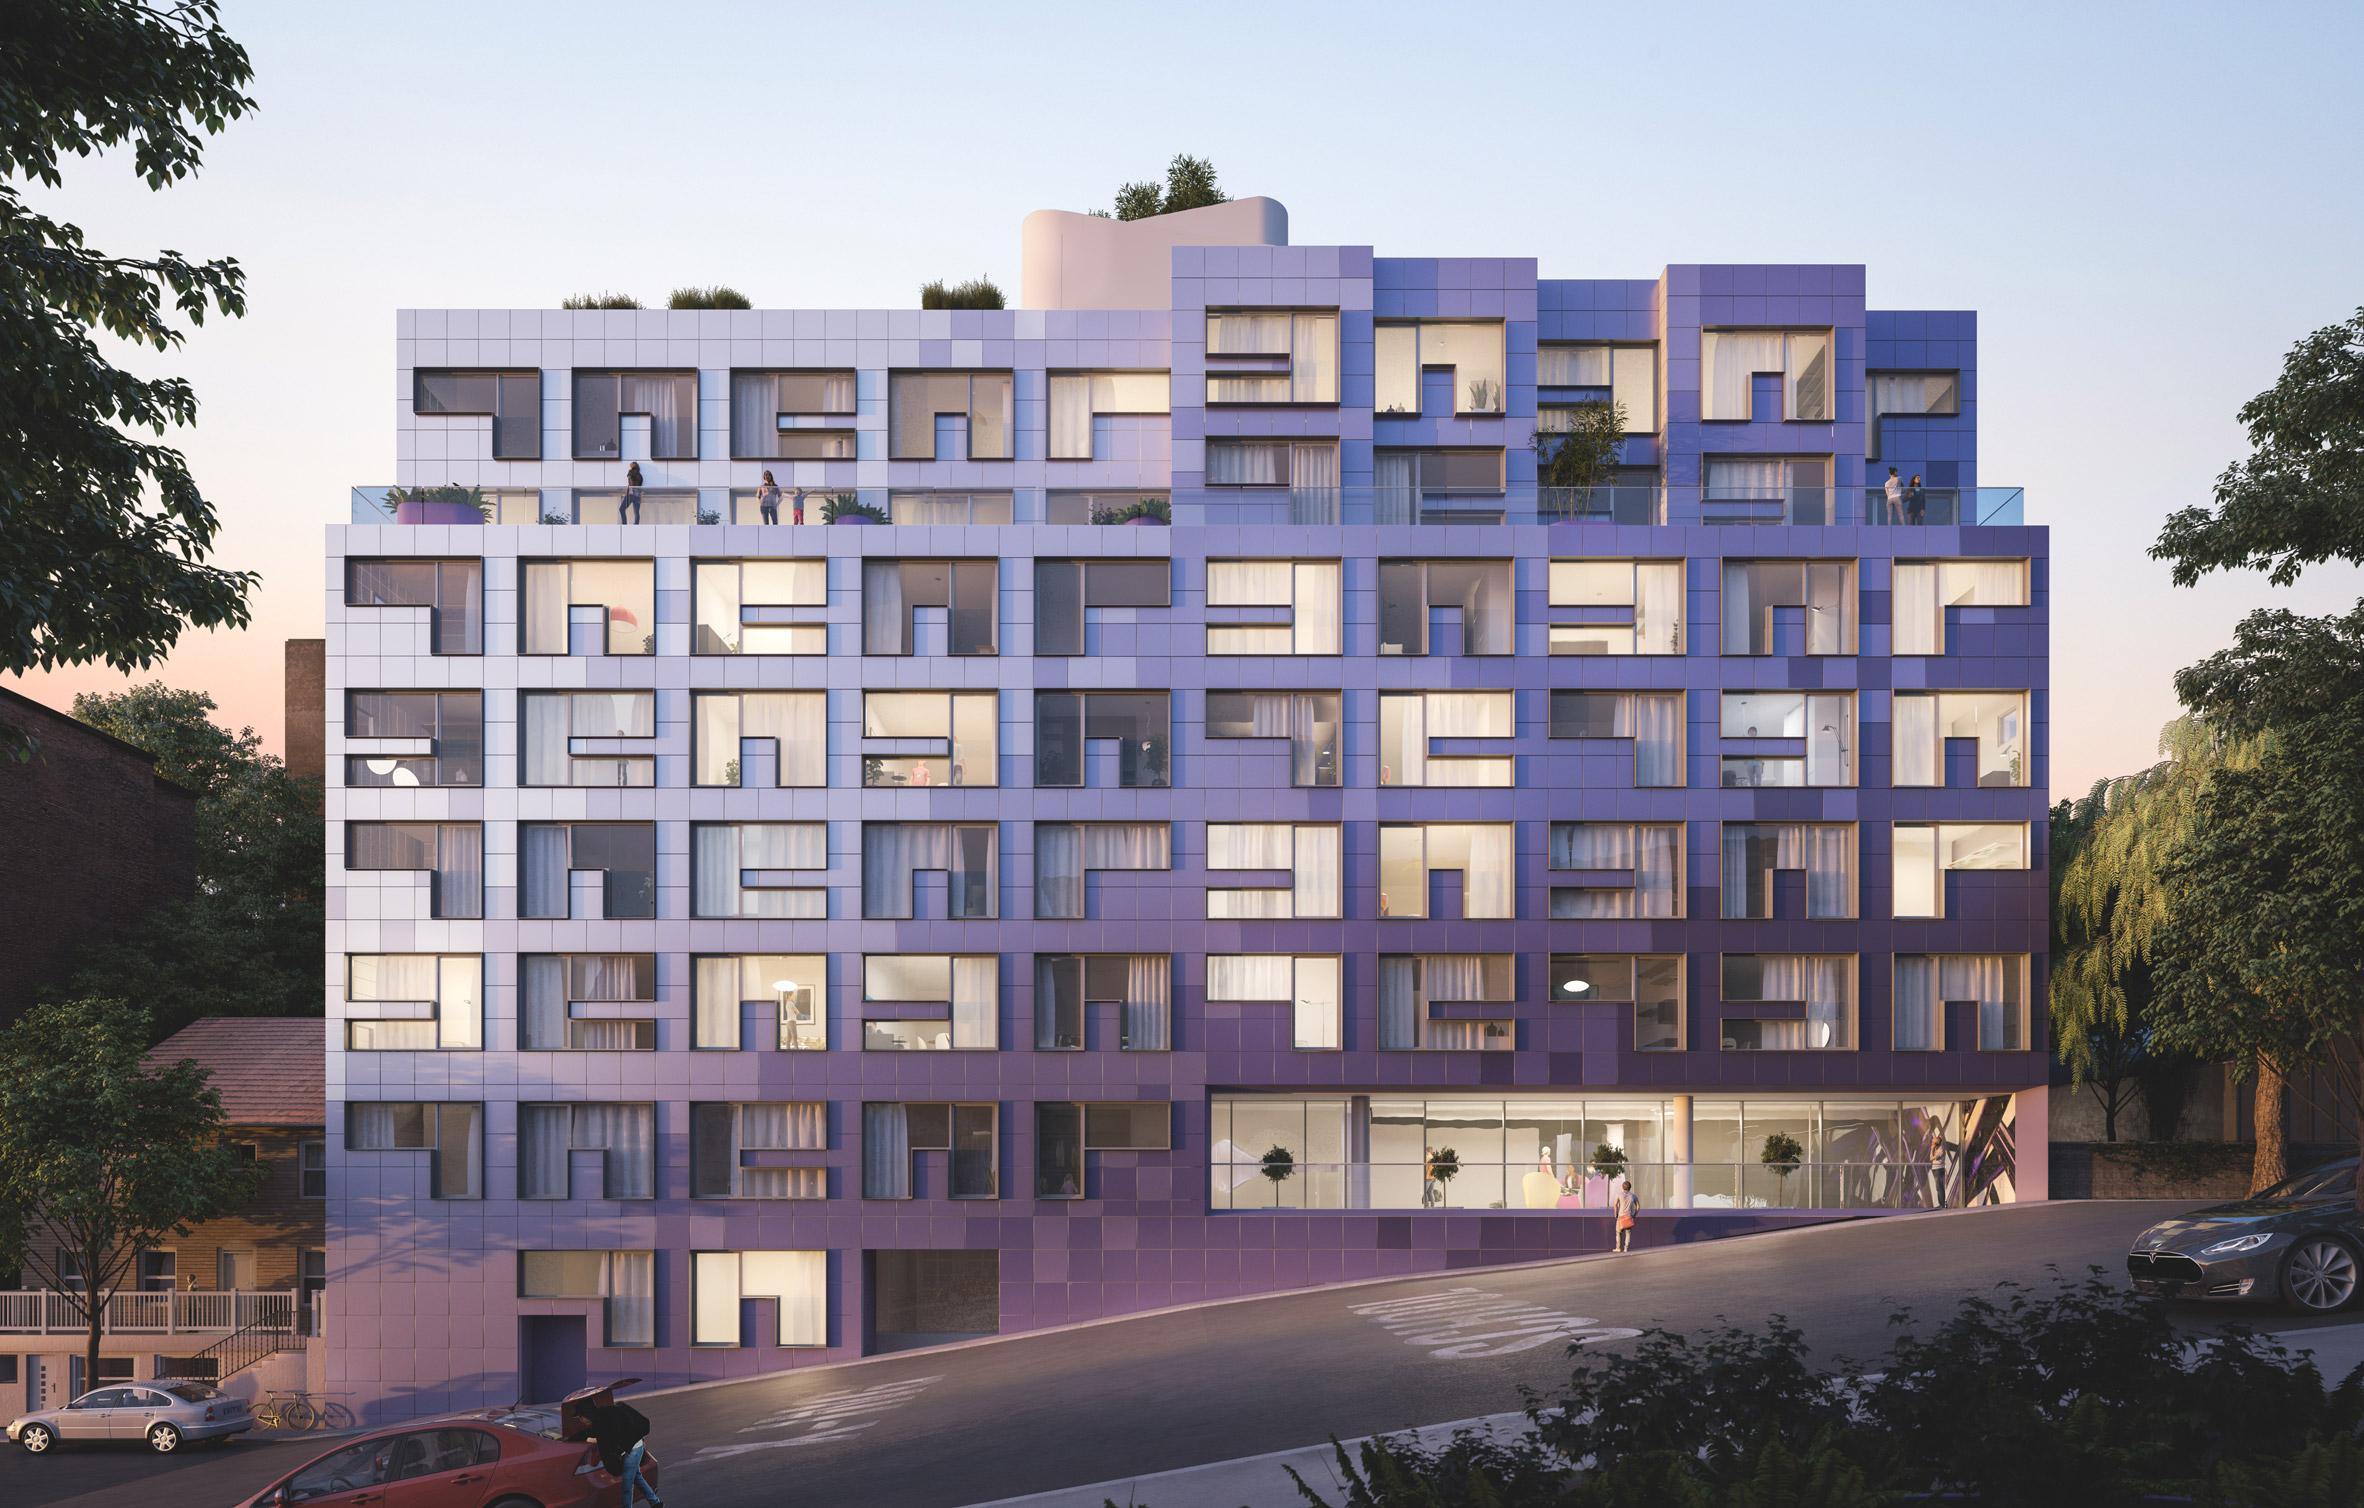 karim rashid residential-ის სურათის შედეგი